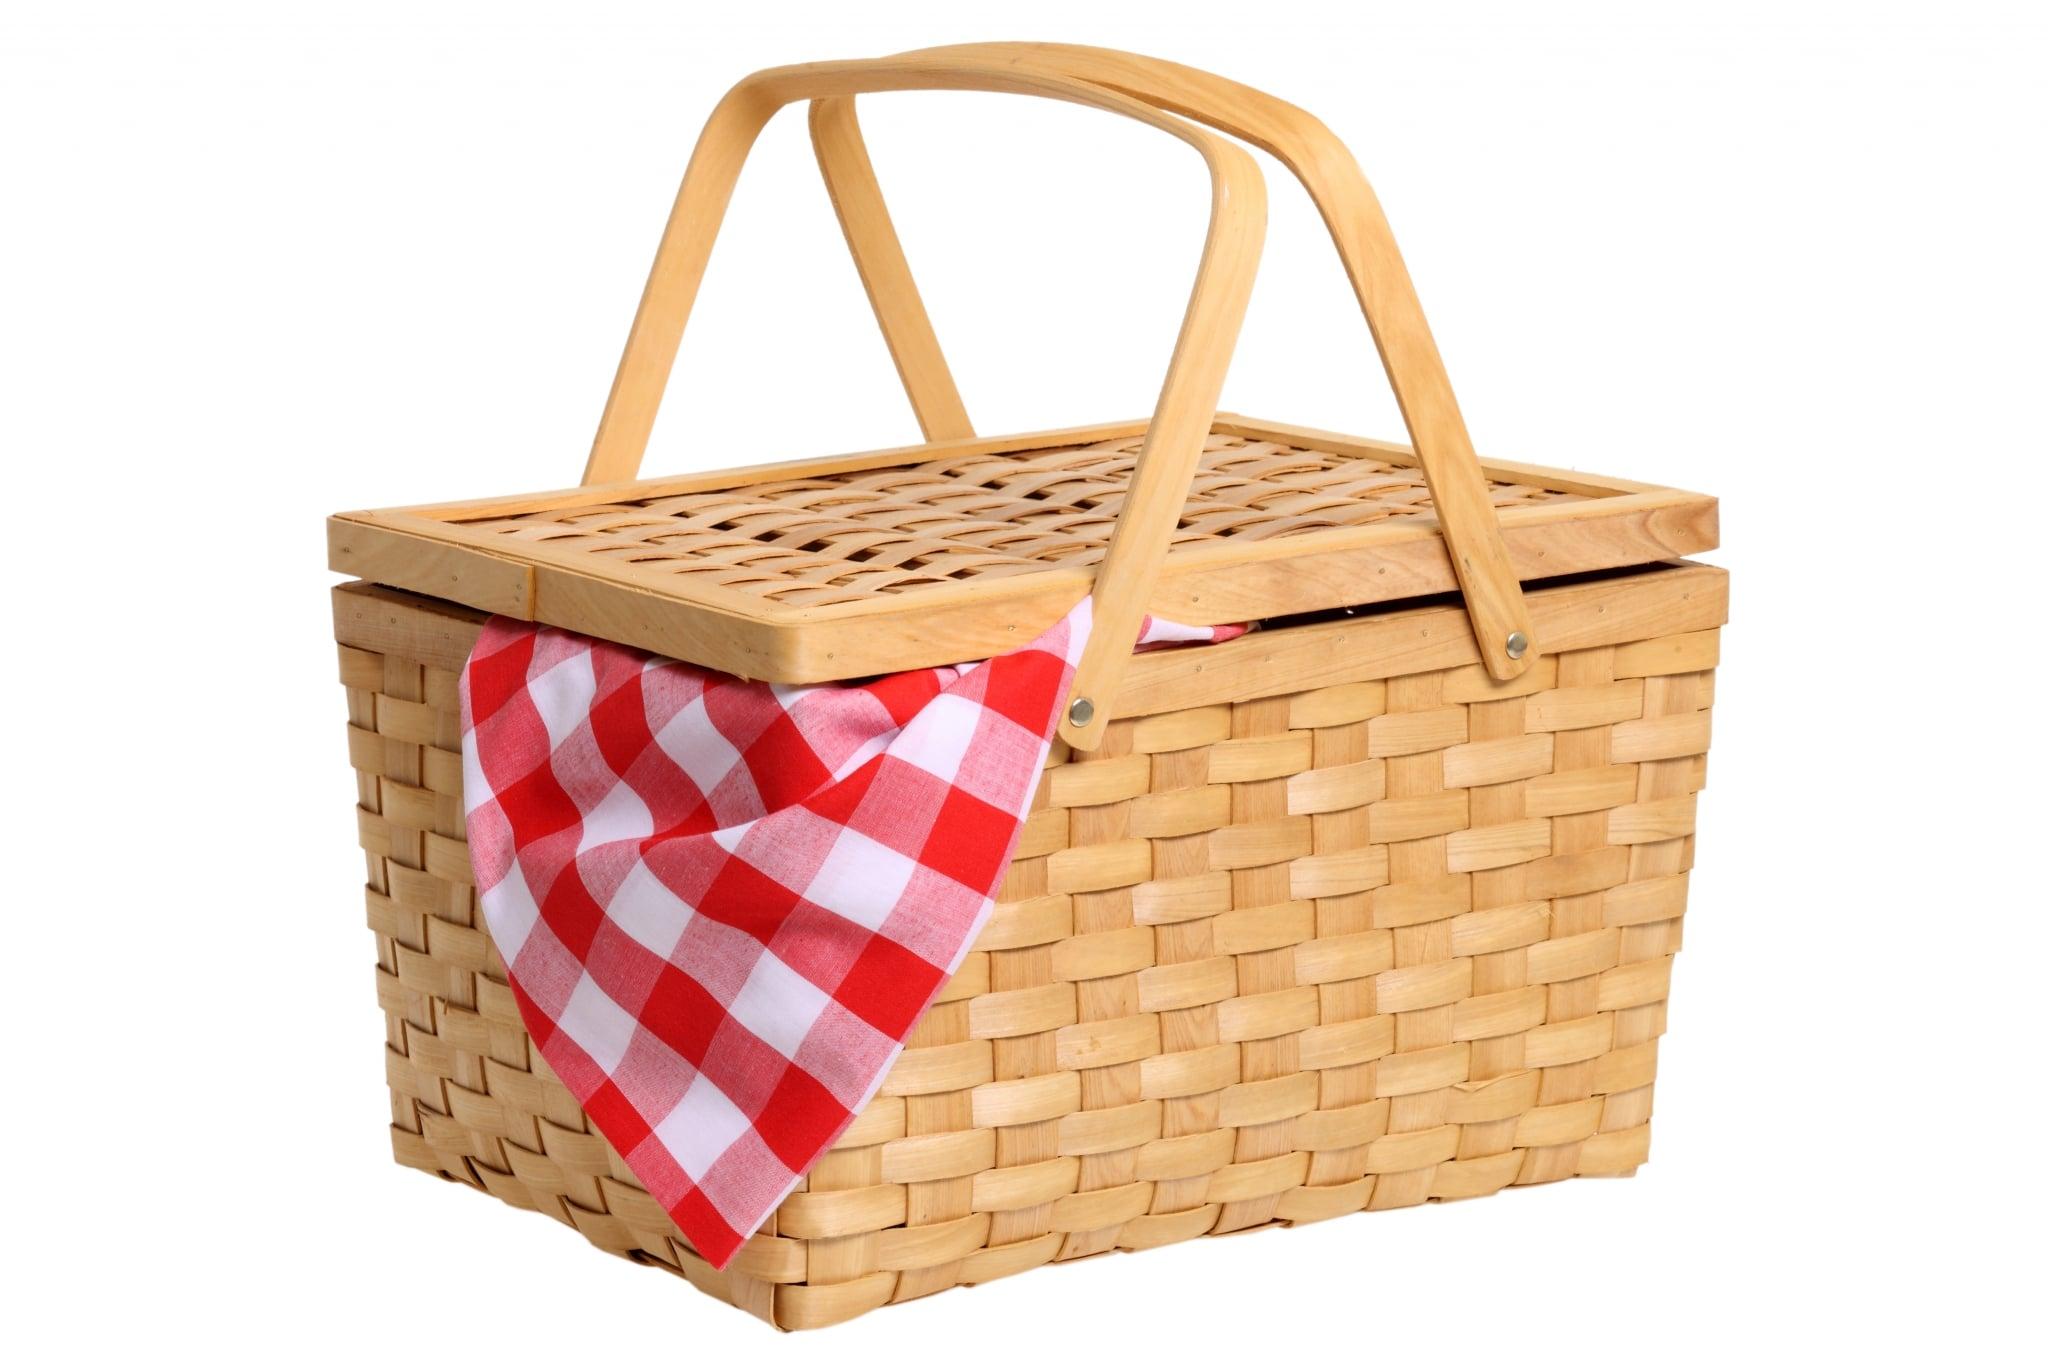 Picnic basket cutout on white background